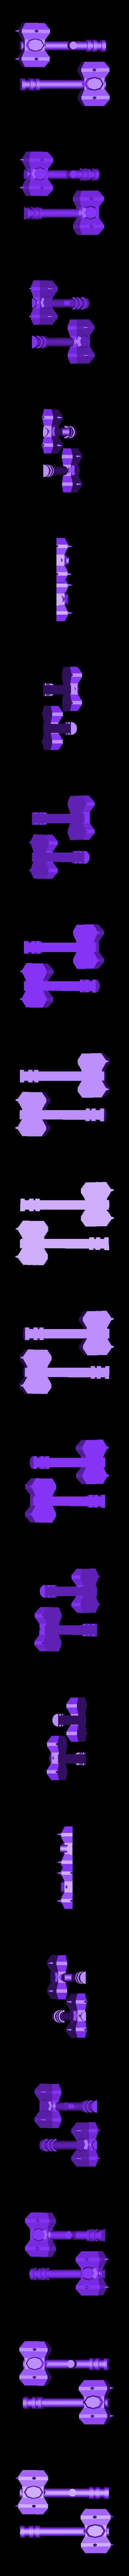 Split_Hammer.stl Download free STL file Modular Mech SteamPunk • Design to 3D print, mrhers2